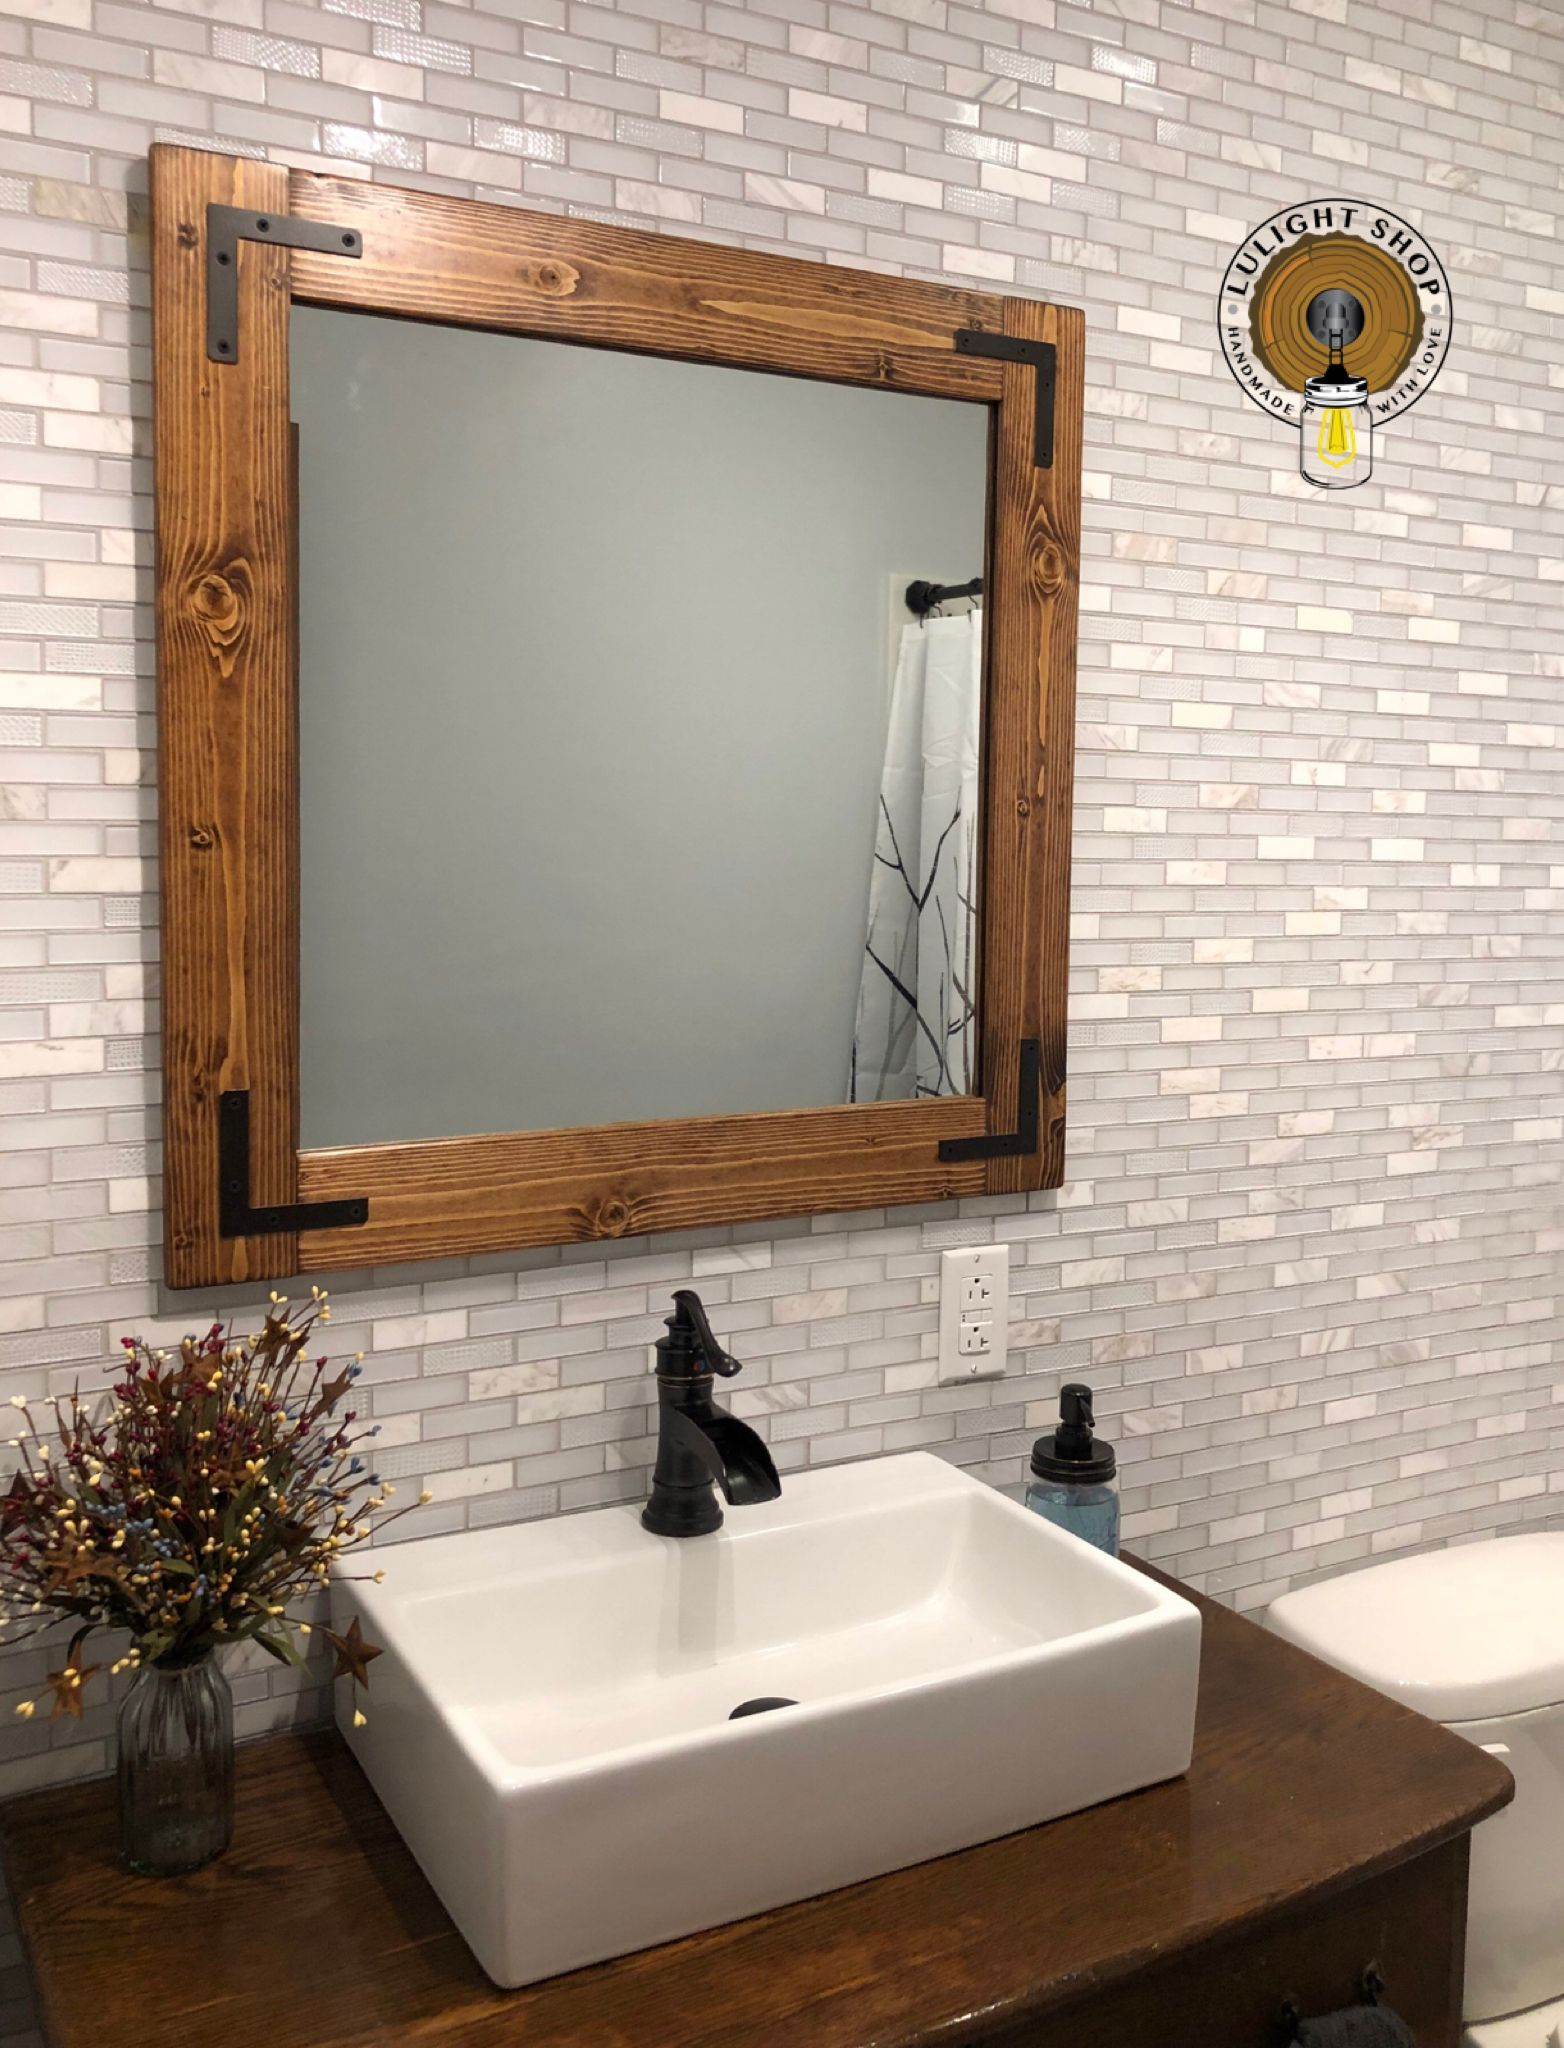 Handmade Mirror By Lulight Shop Bathroom Mirror Rustic Mirror Vanity Mirror Wall Mirror Framed Mirror Wood Framed Mirror Framed Mirror Wall Rustic Mirrors [ 2048 x 1564 Pixel ]